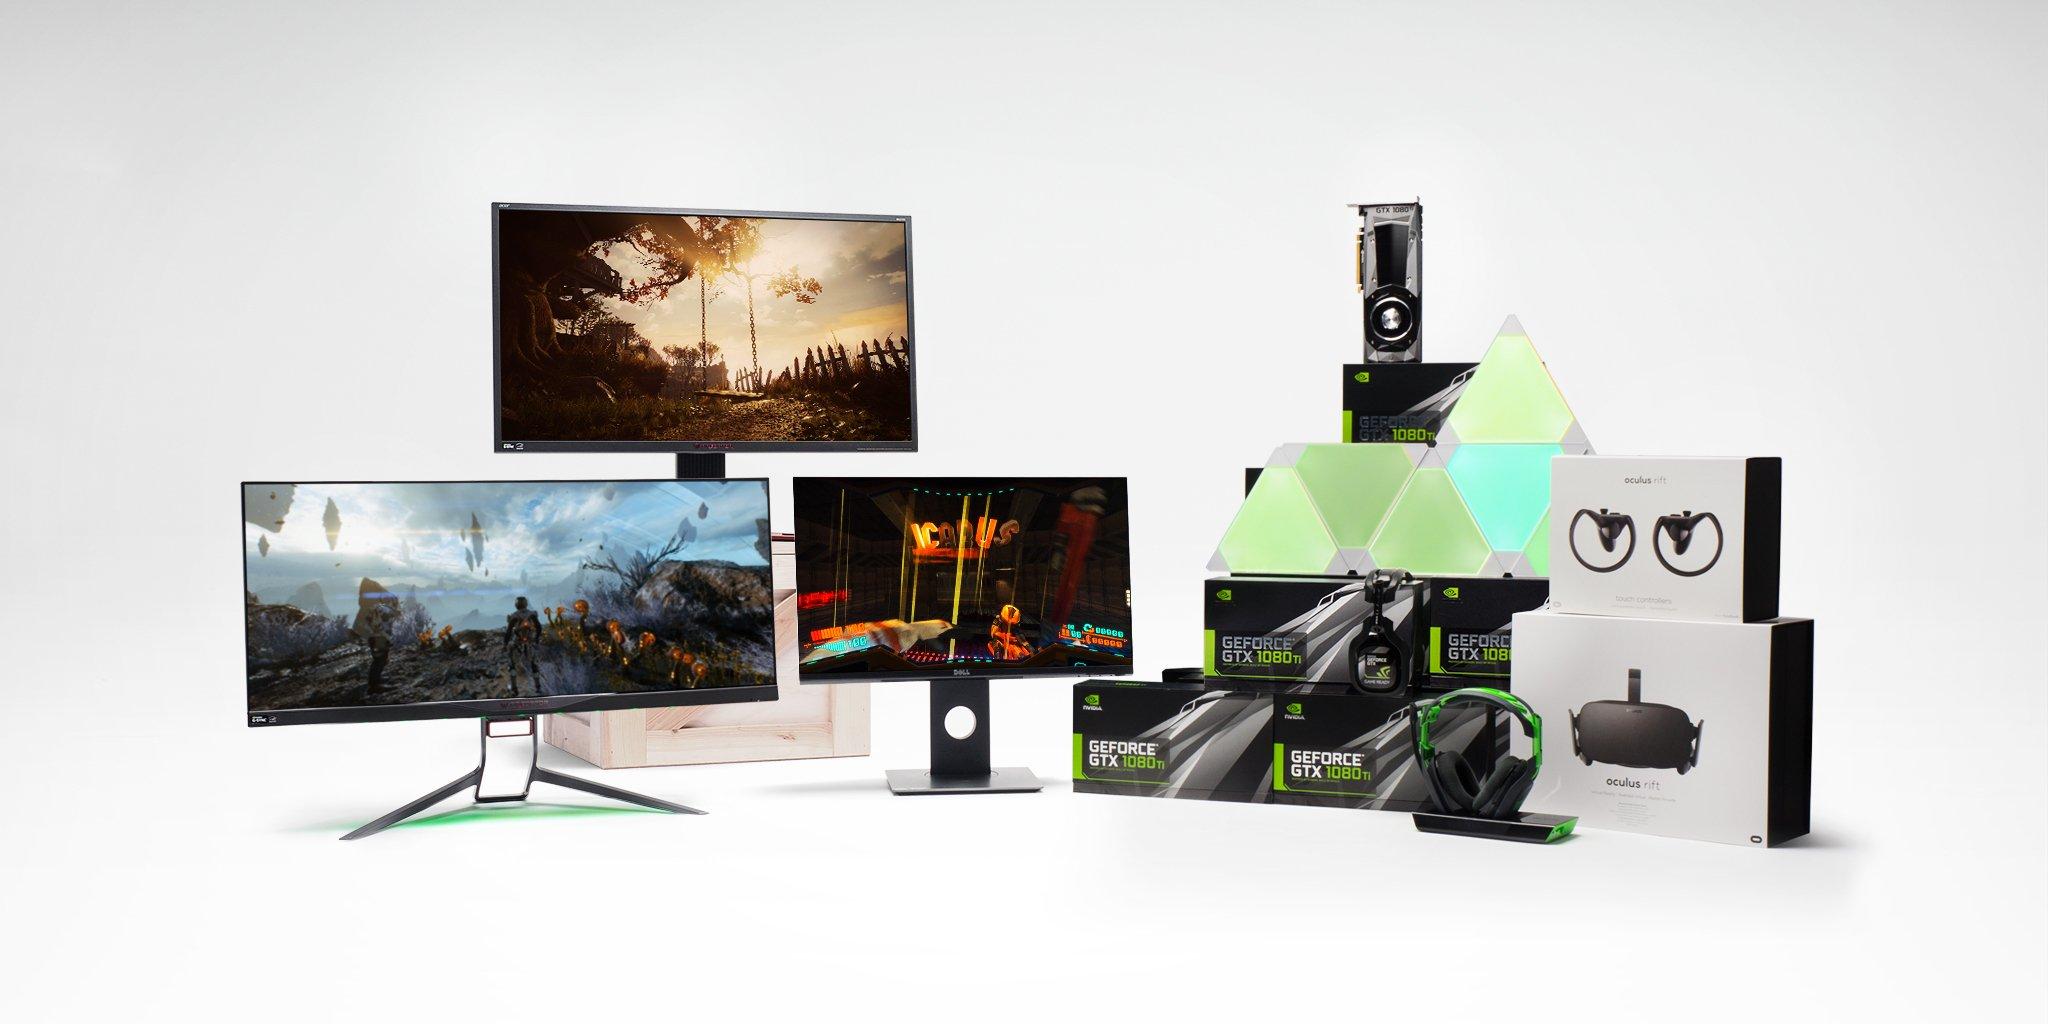 NVIDIA GeForce Announces #GAMEREADY E3 2017 Contest